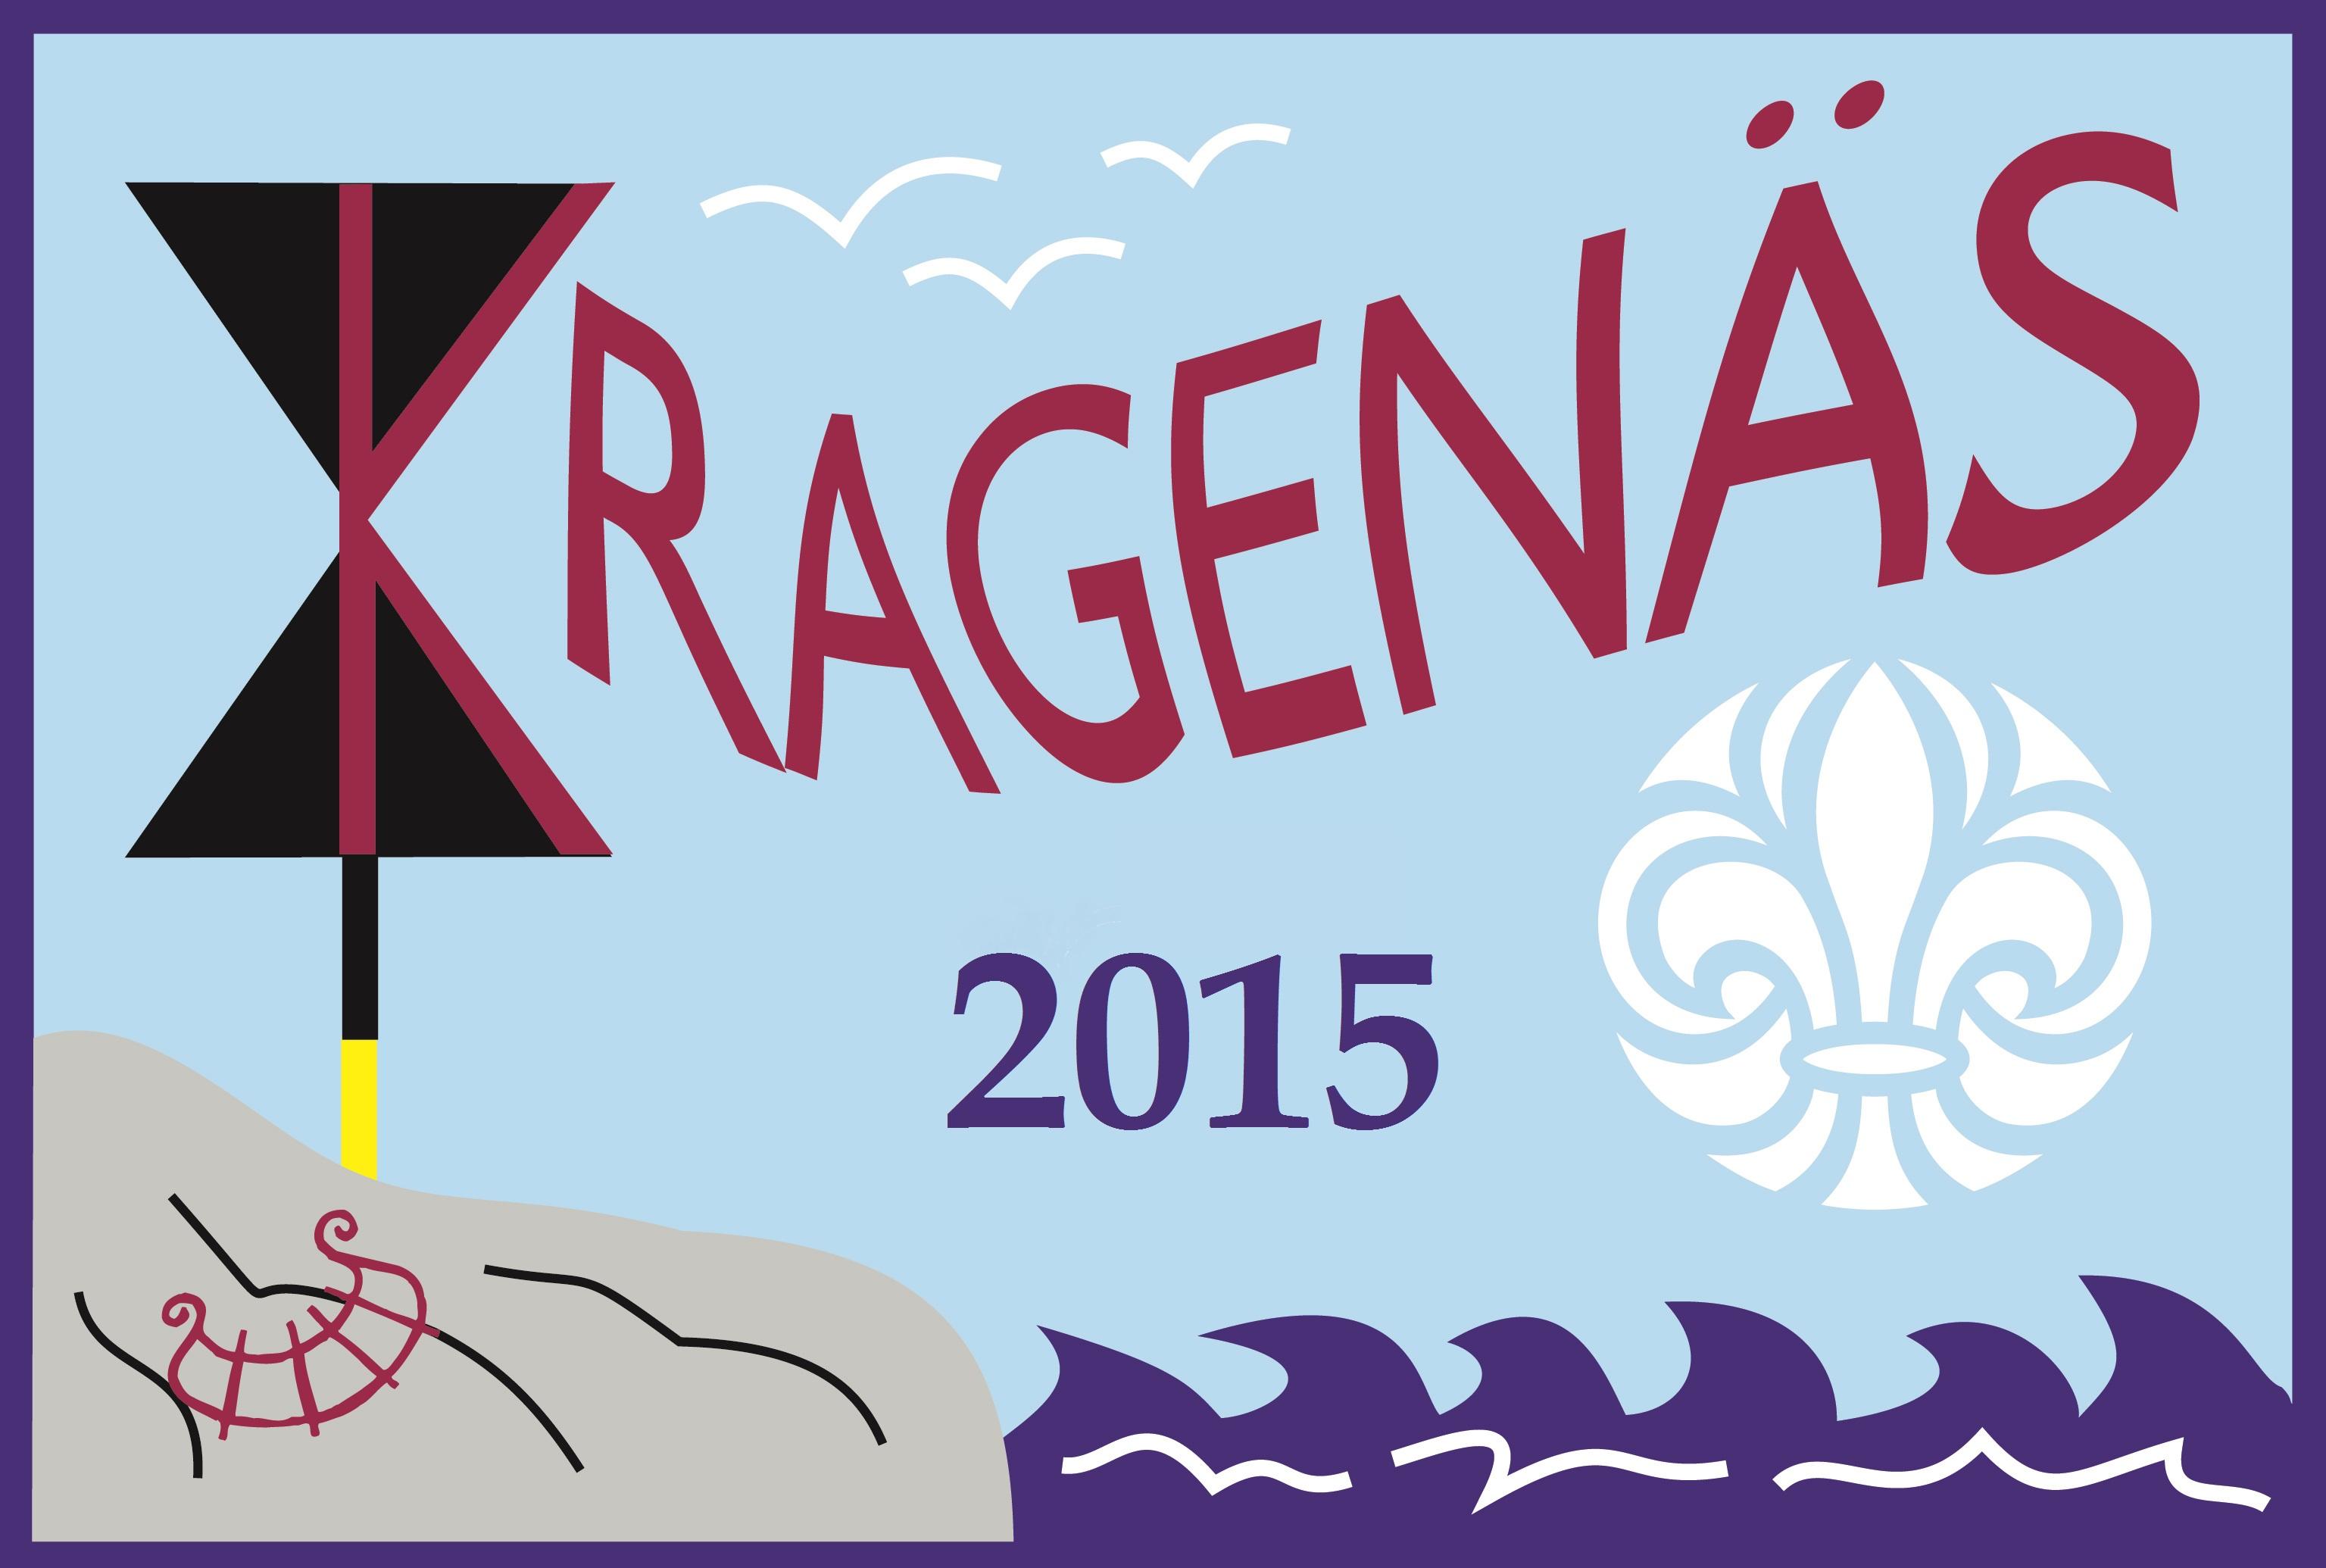 Kragenas_2015